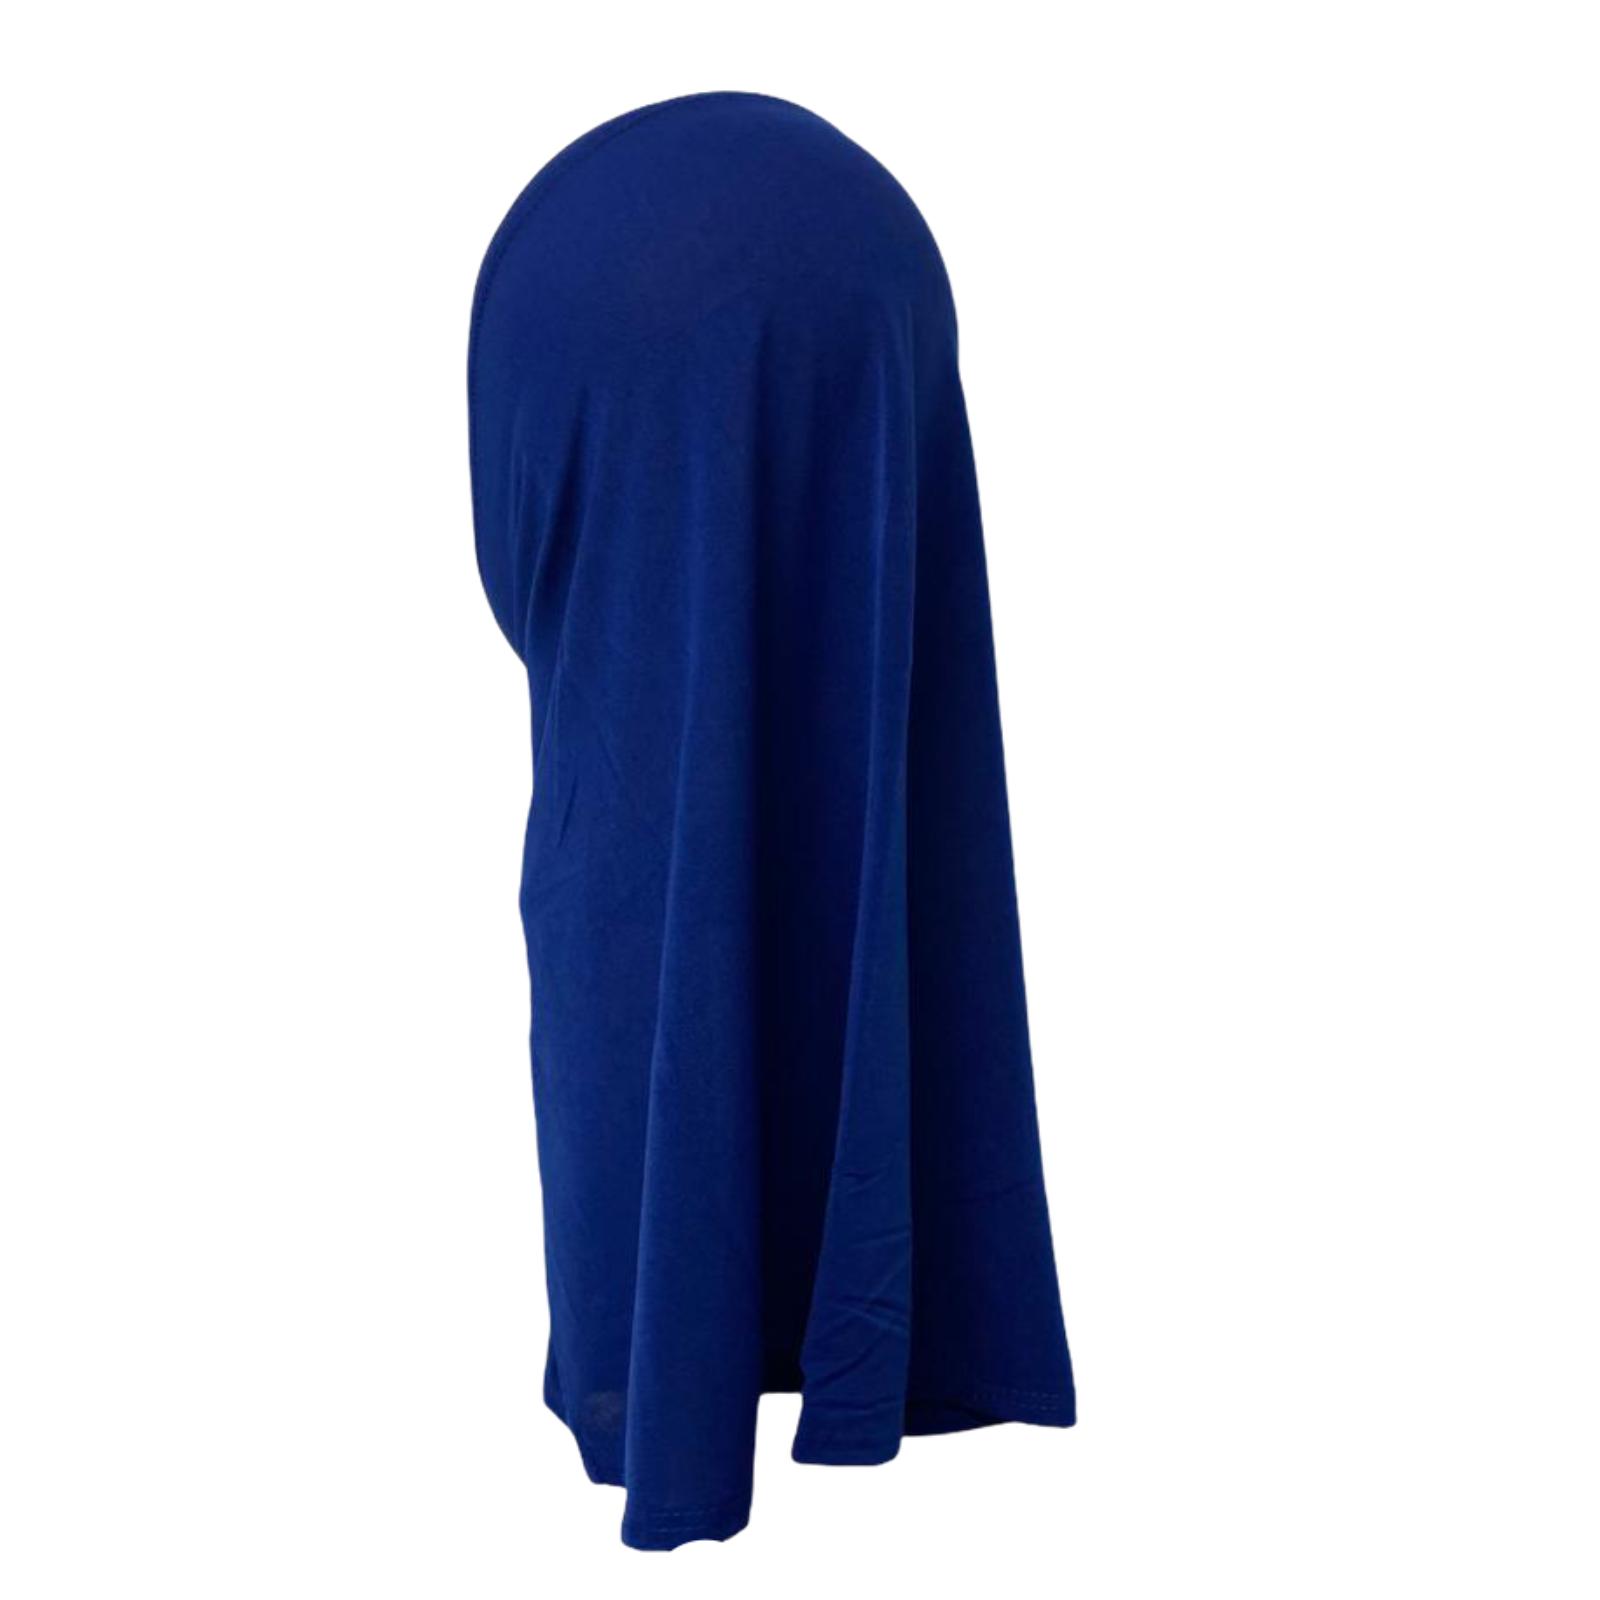 One Piece stretchy Hijab Jilbab Scarf School ready made Muslim Black Blue White